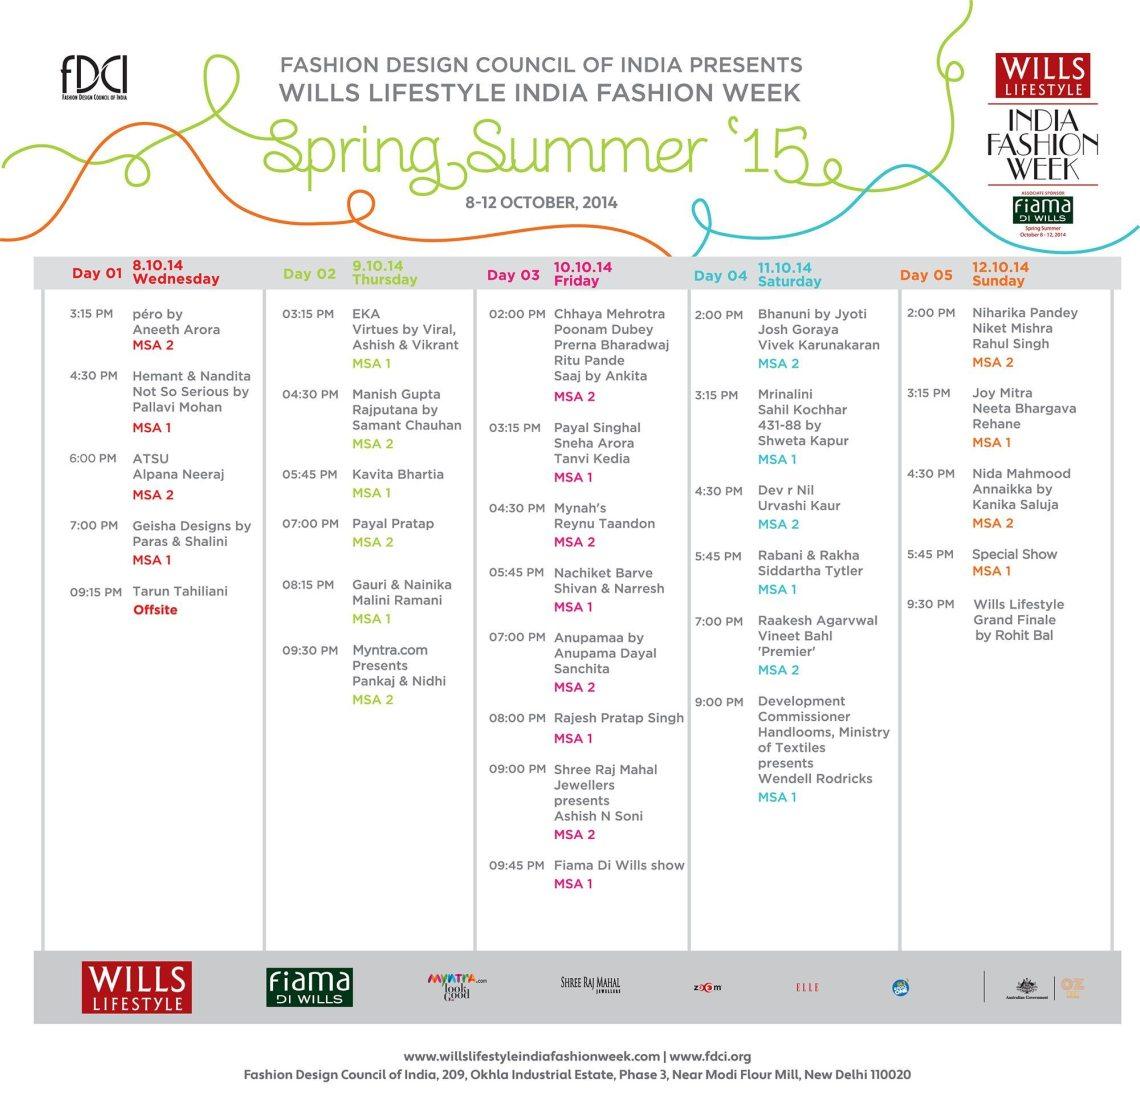 FDCI-Wills-Lifestyle-India-Fashion-Week-Spring-Summer-2015-NainaCo-Luxury-Photographer-Storyteller-Raconteuse-Schedule